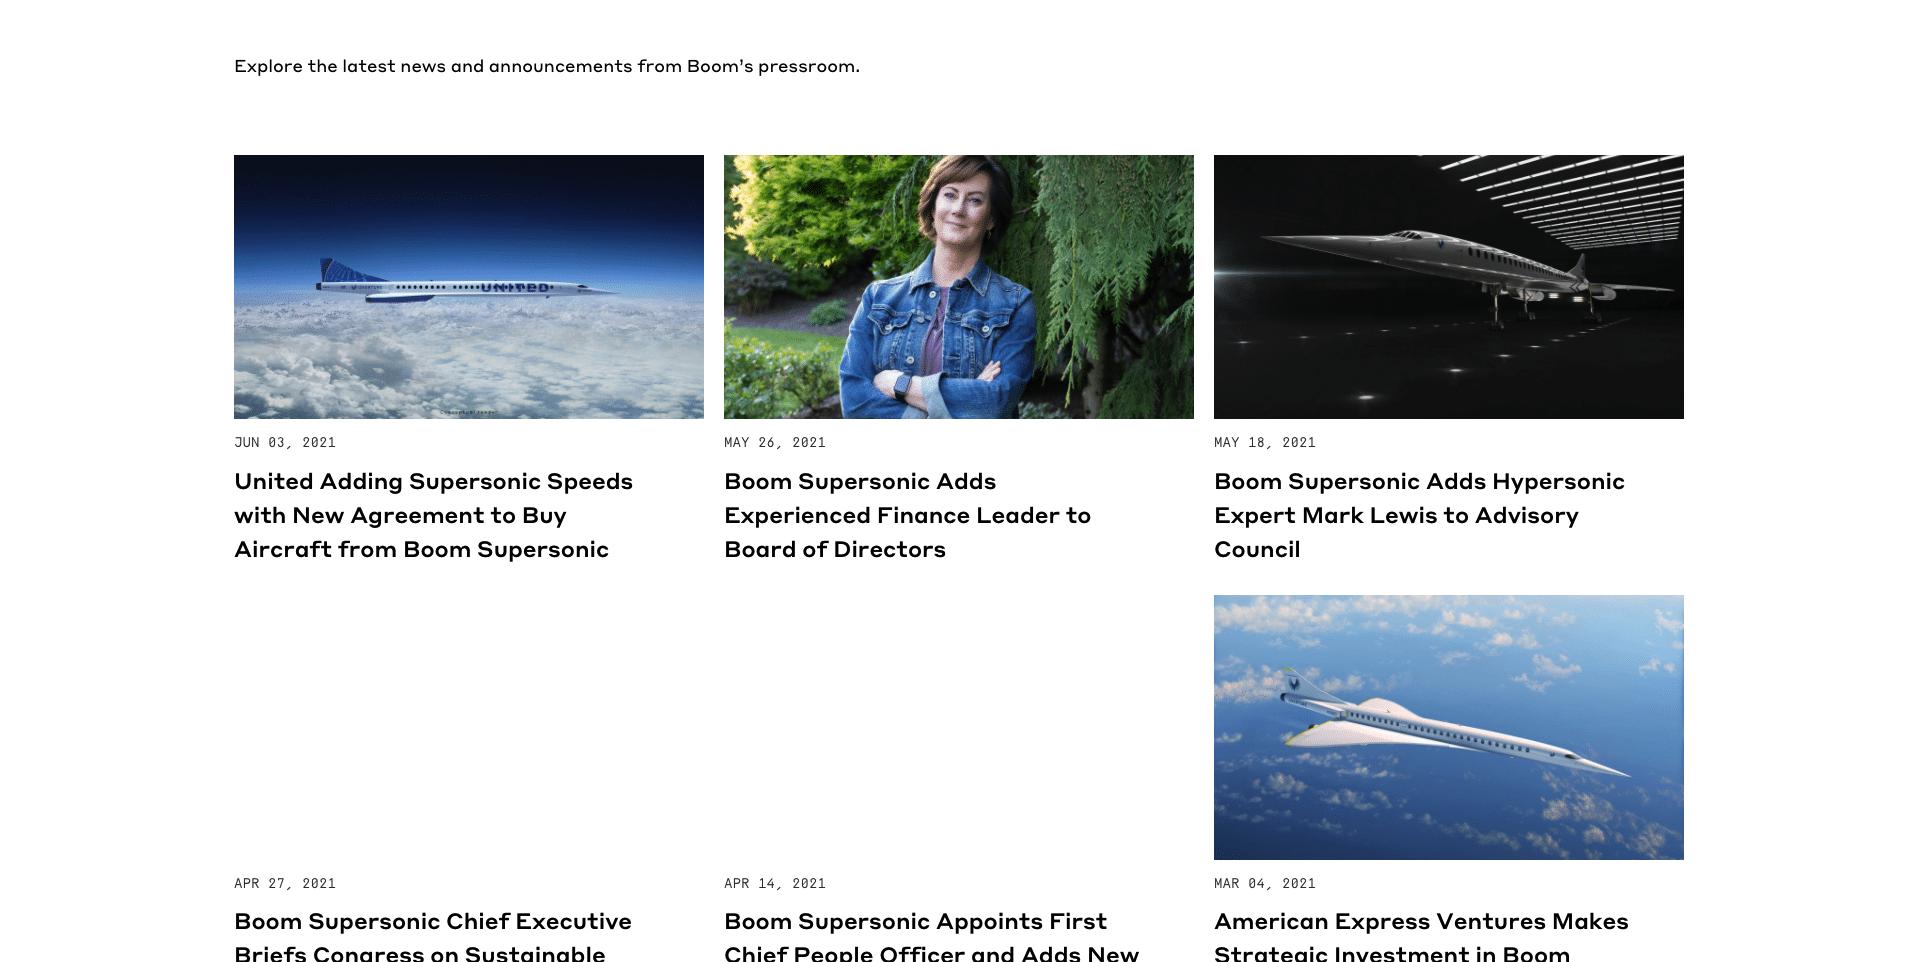 Boom supersonic news